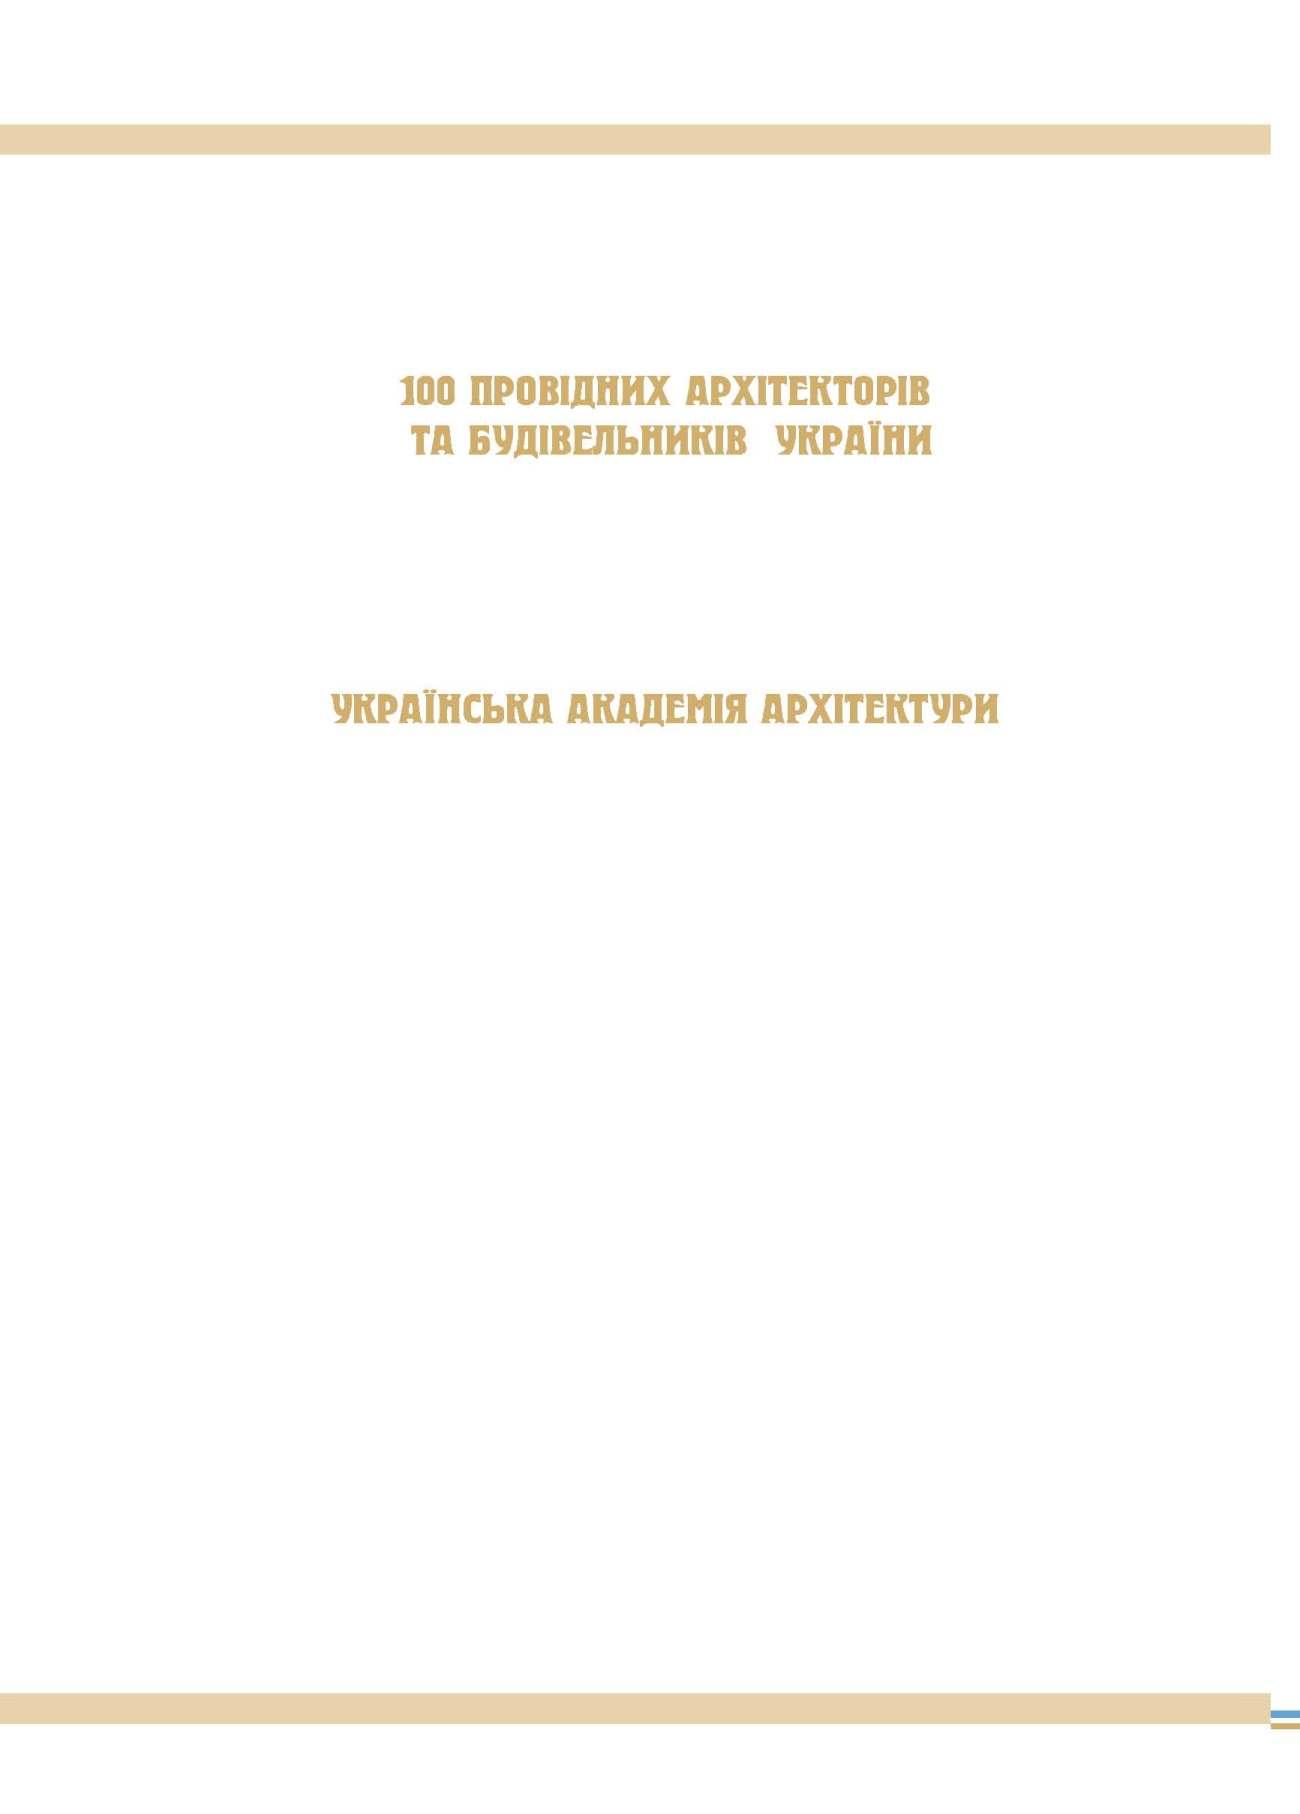 Українська академія архітектури